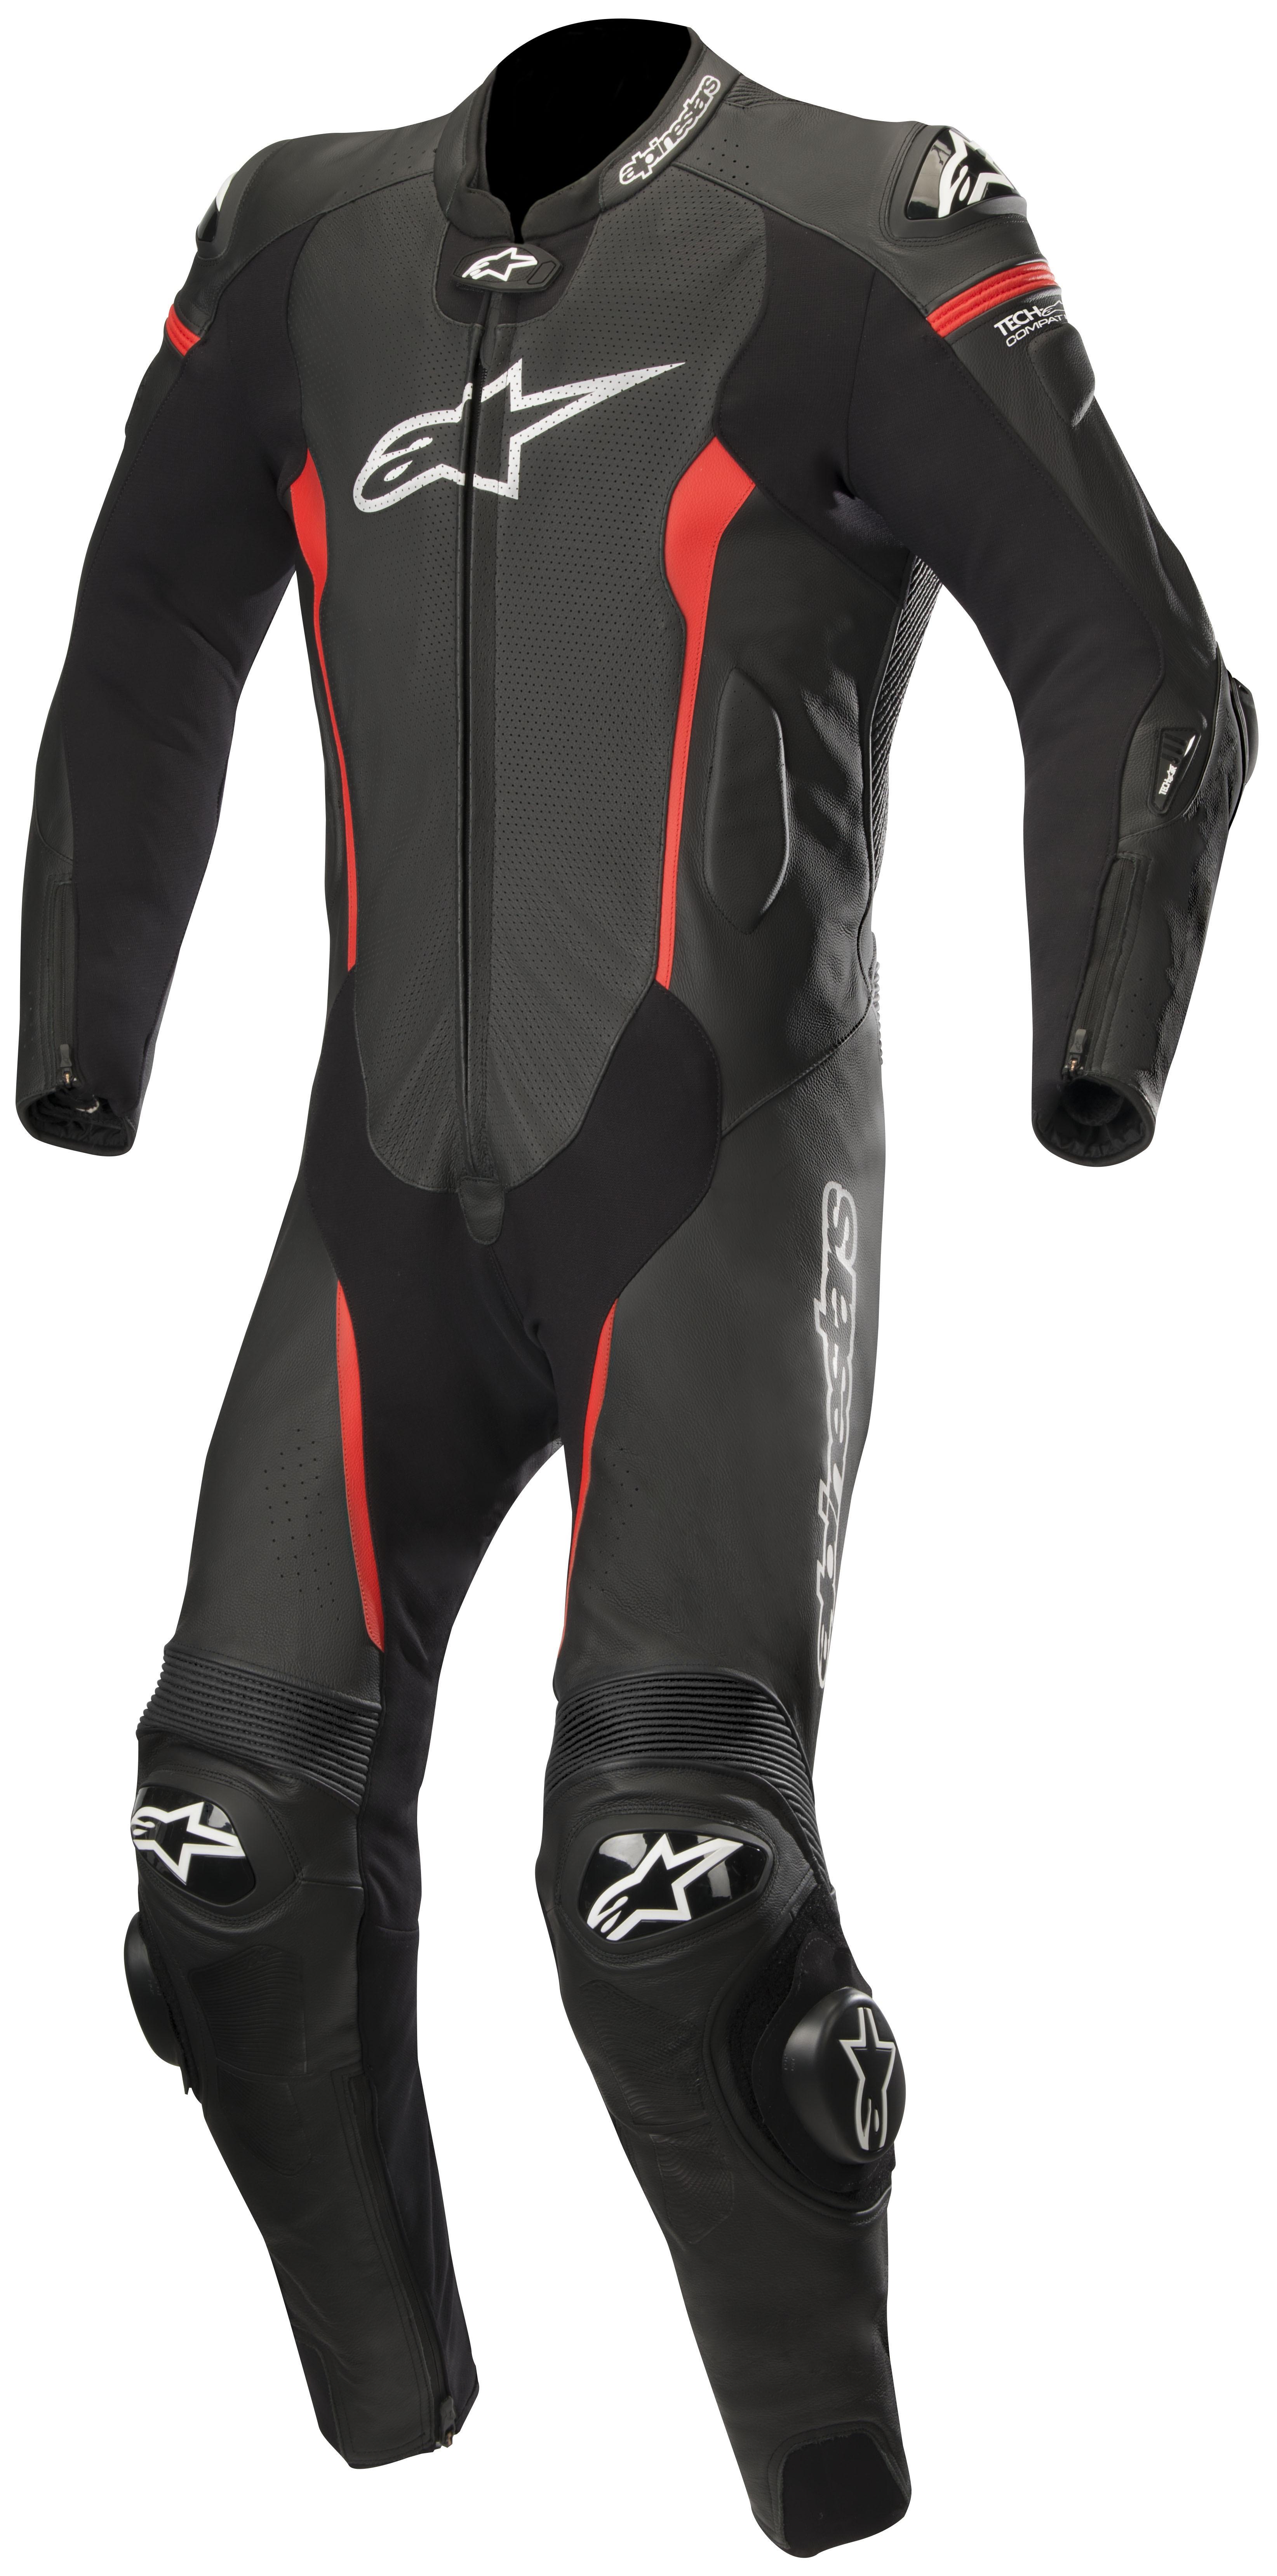 Full Face Cruiser Helmets >> Alpinestars Missile Race Suit For Tech Air Race - Cycle Gear